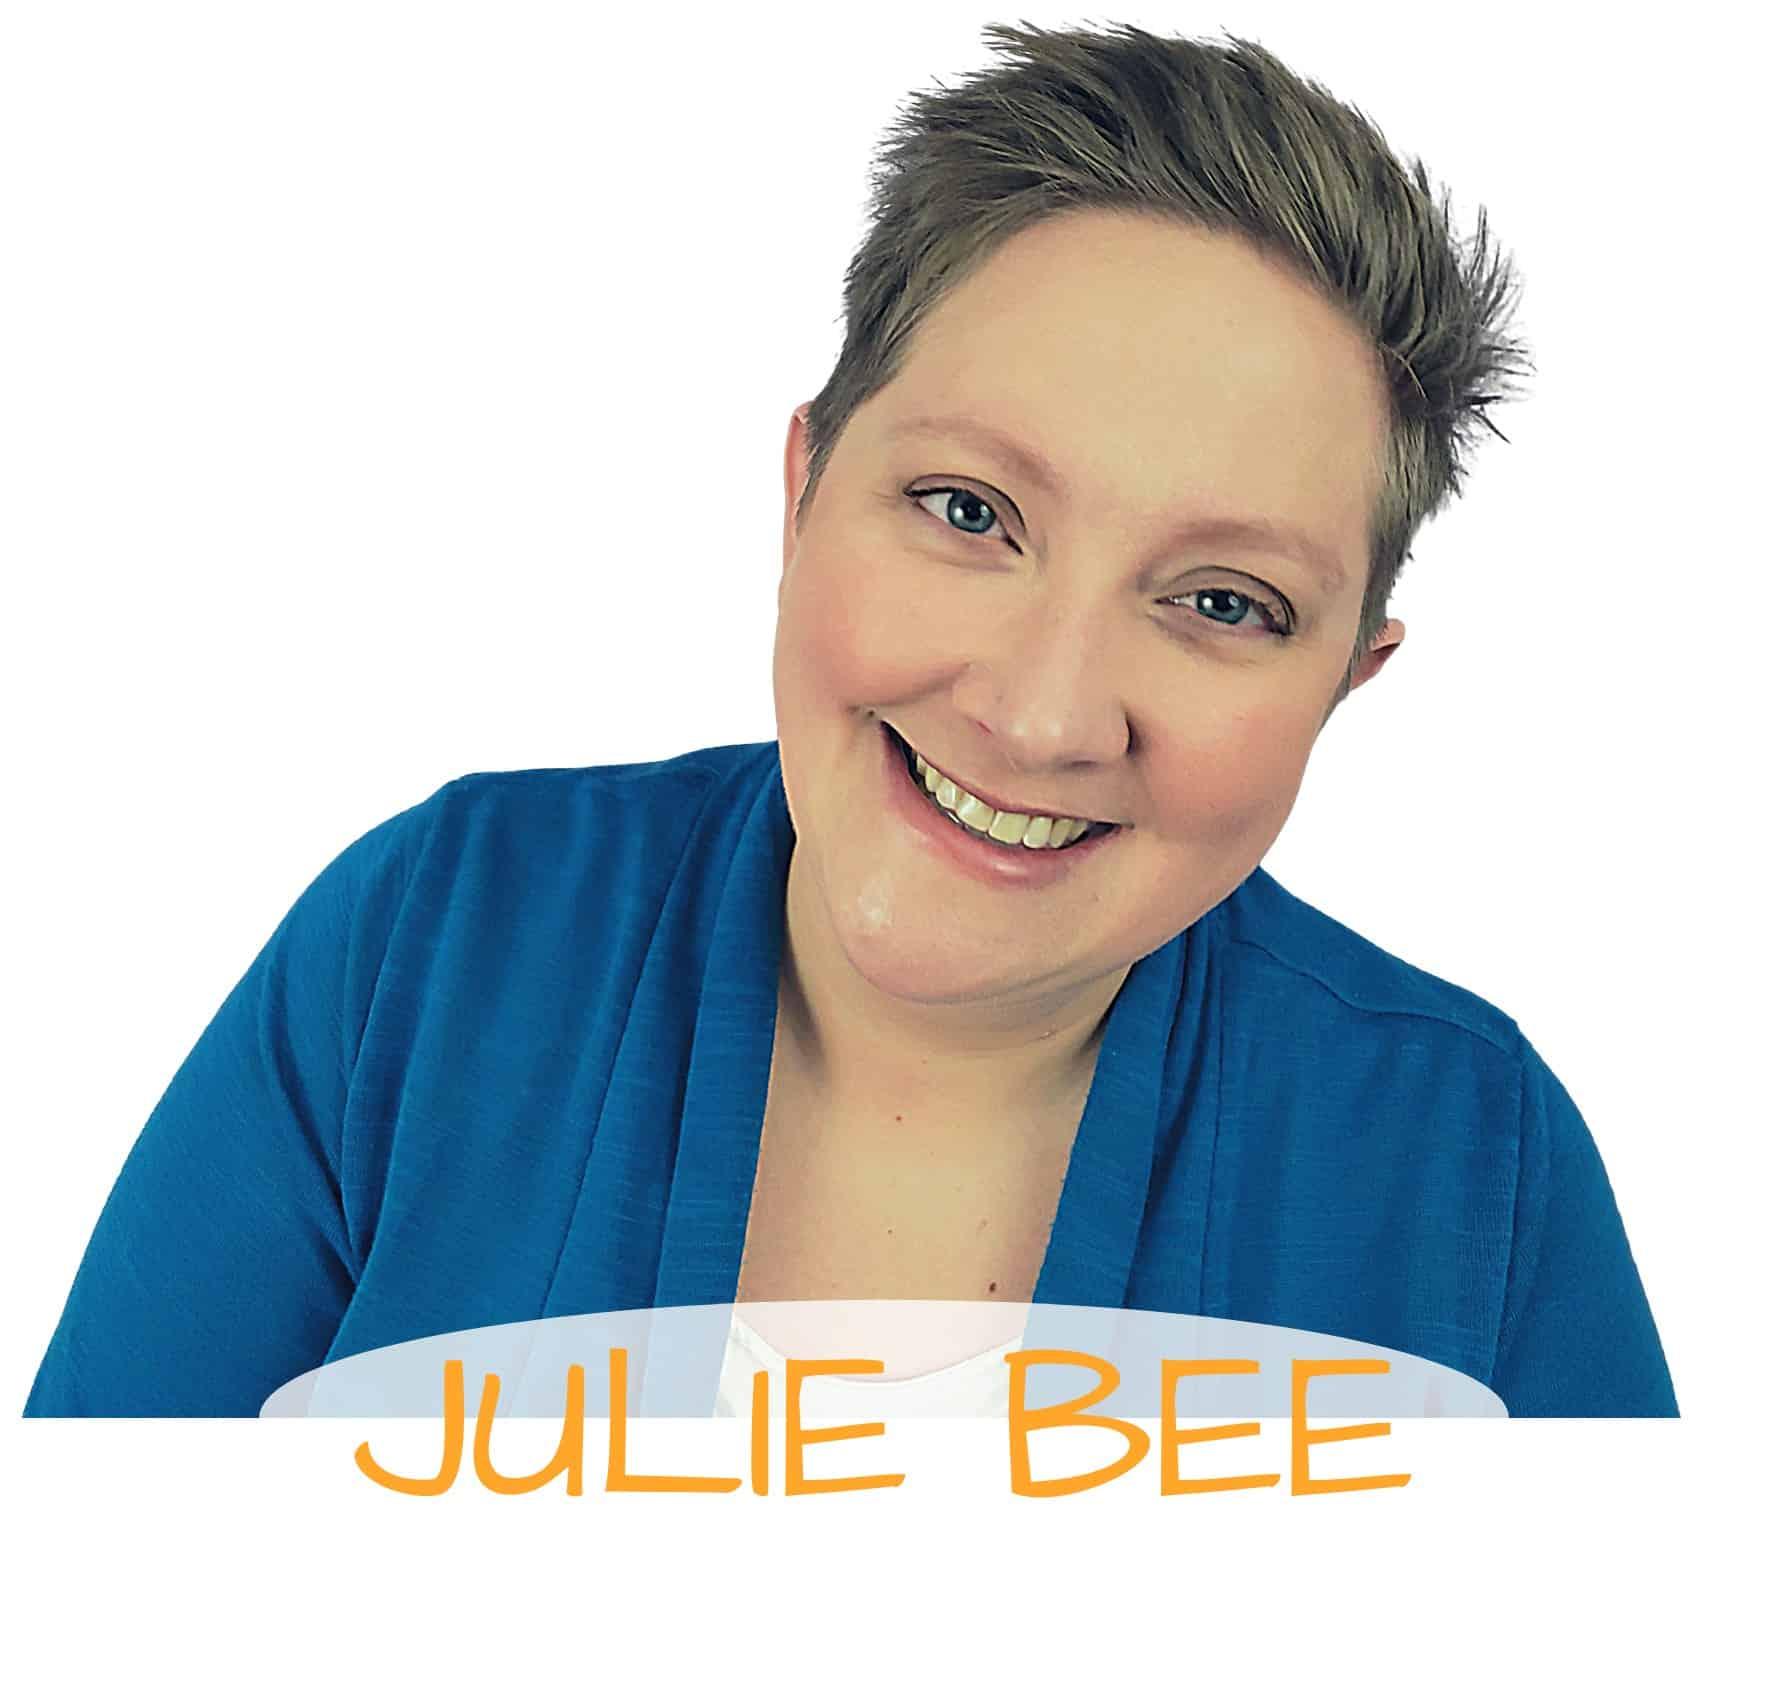 Julie Bee Smilint